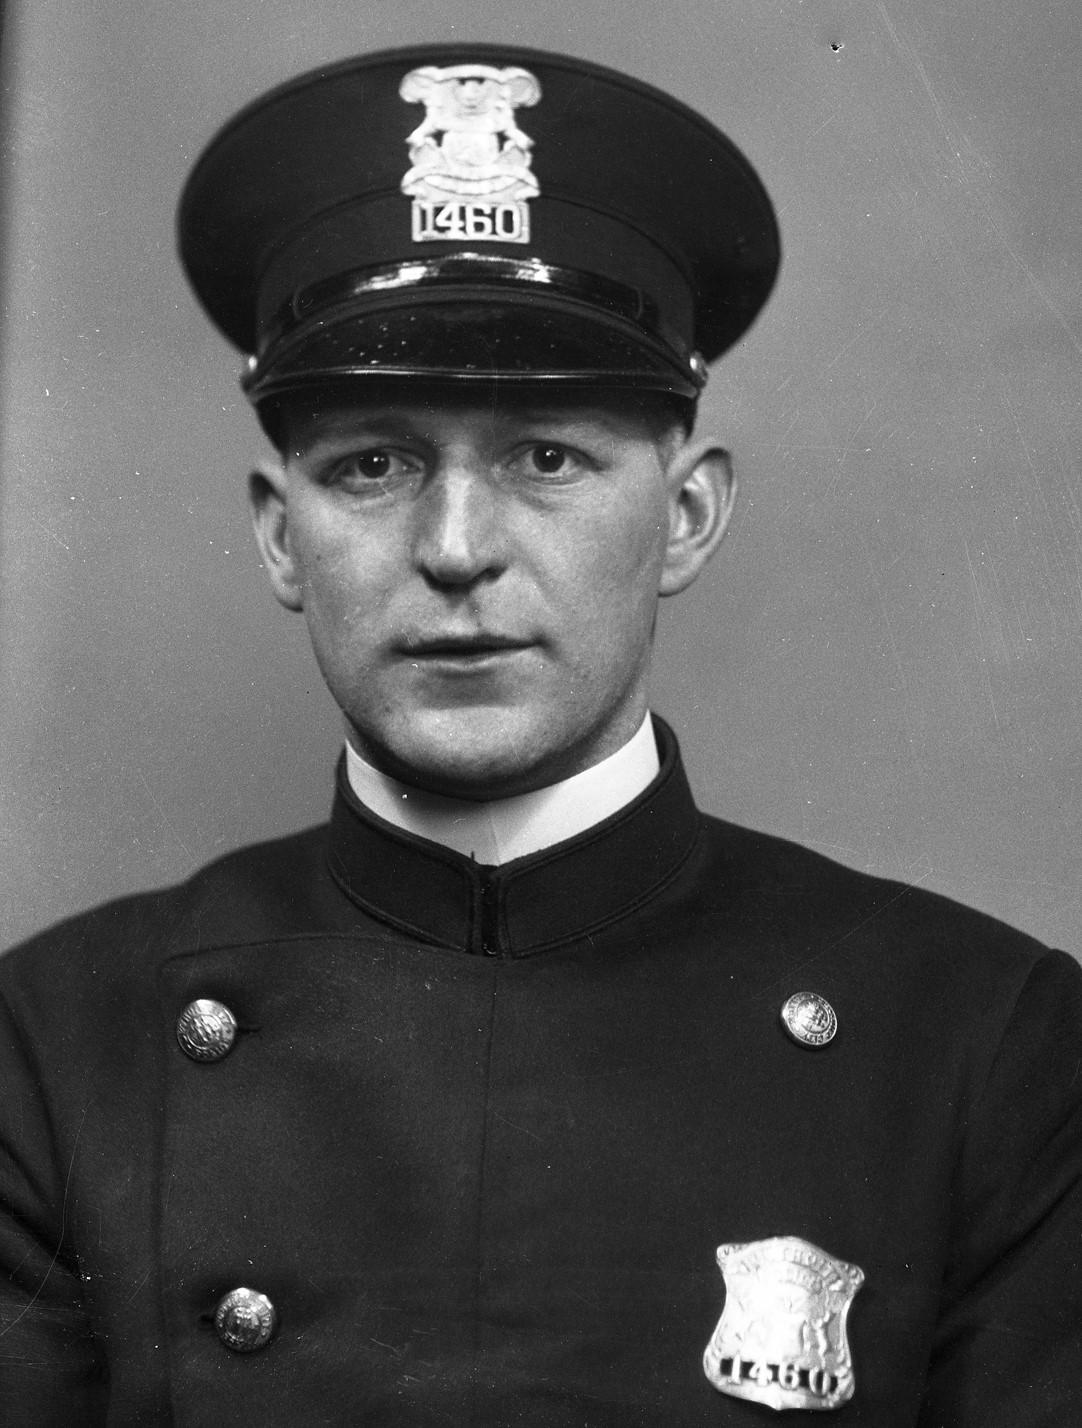 Police Officer Isaac Kruka   Detroit Police Department, Michigan